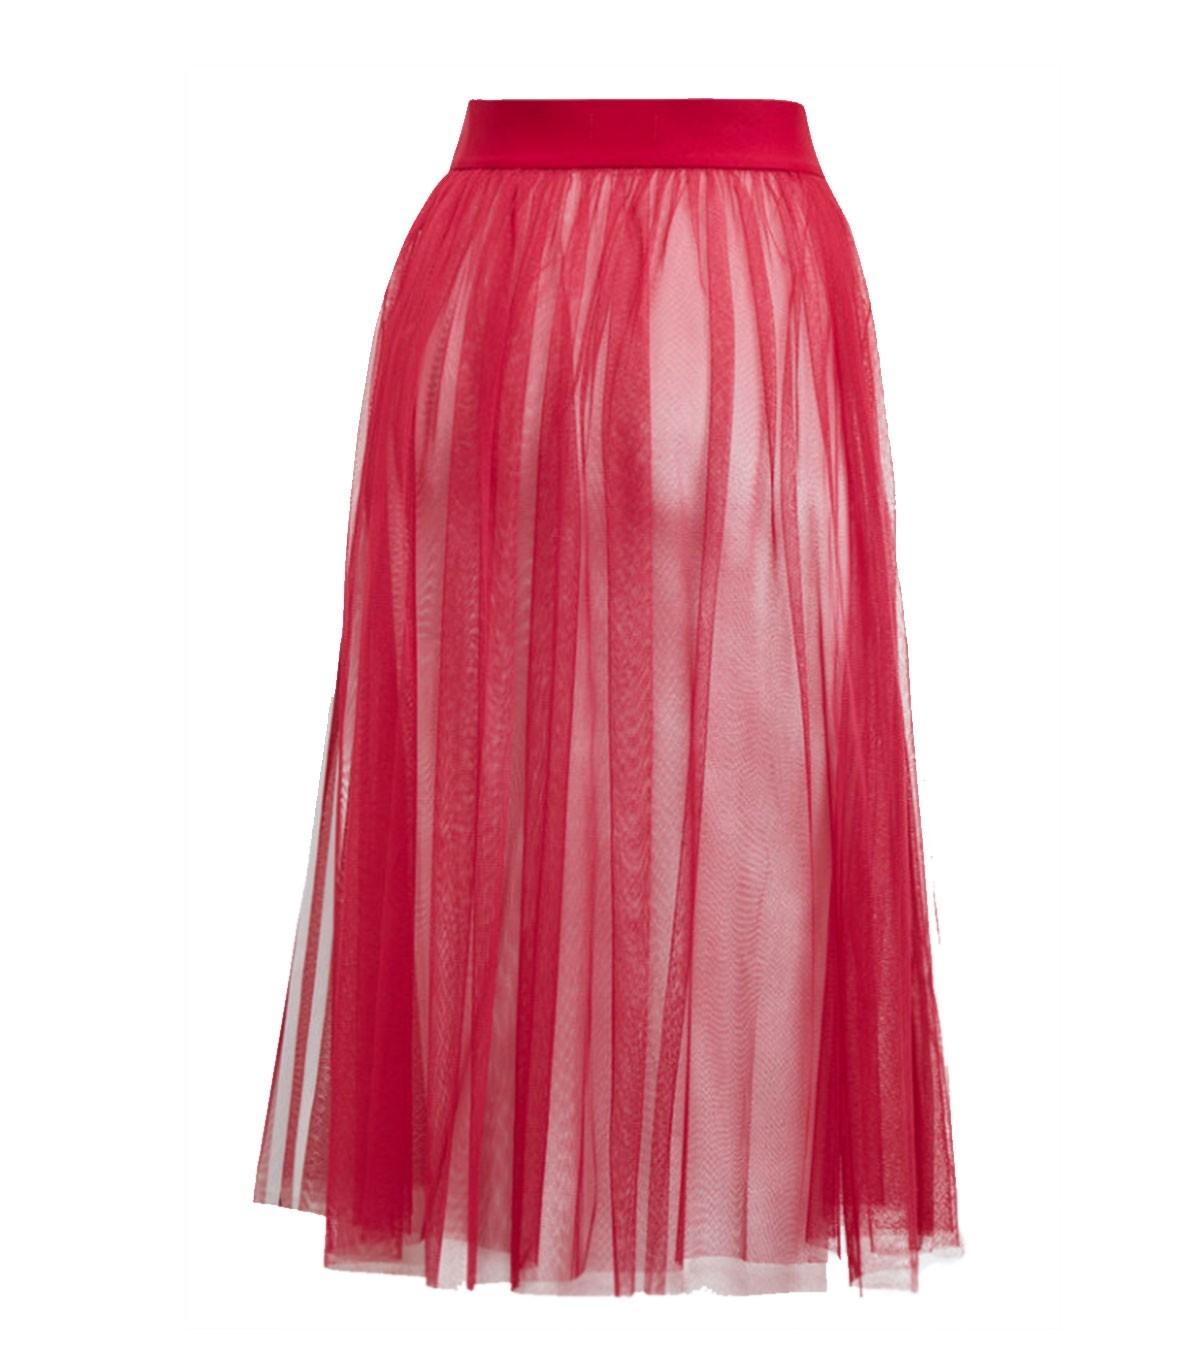 45069a79b Comprar Falda Adidas Skirt Tulle   ADIDAS ORIGINALS